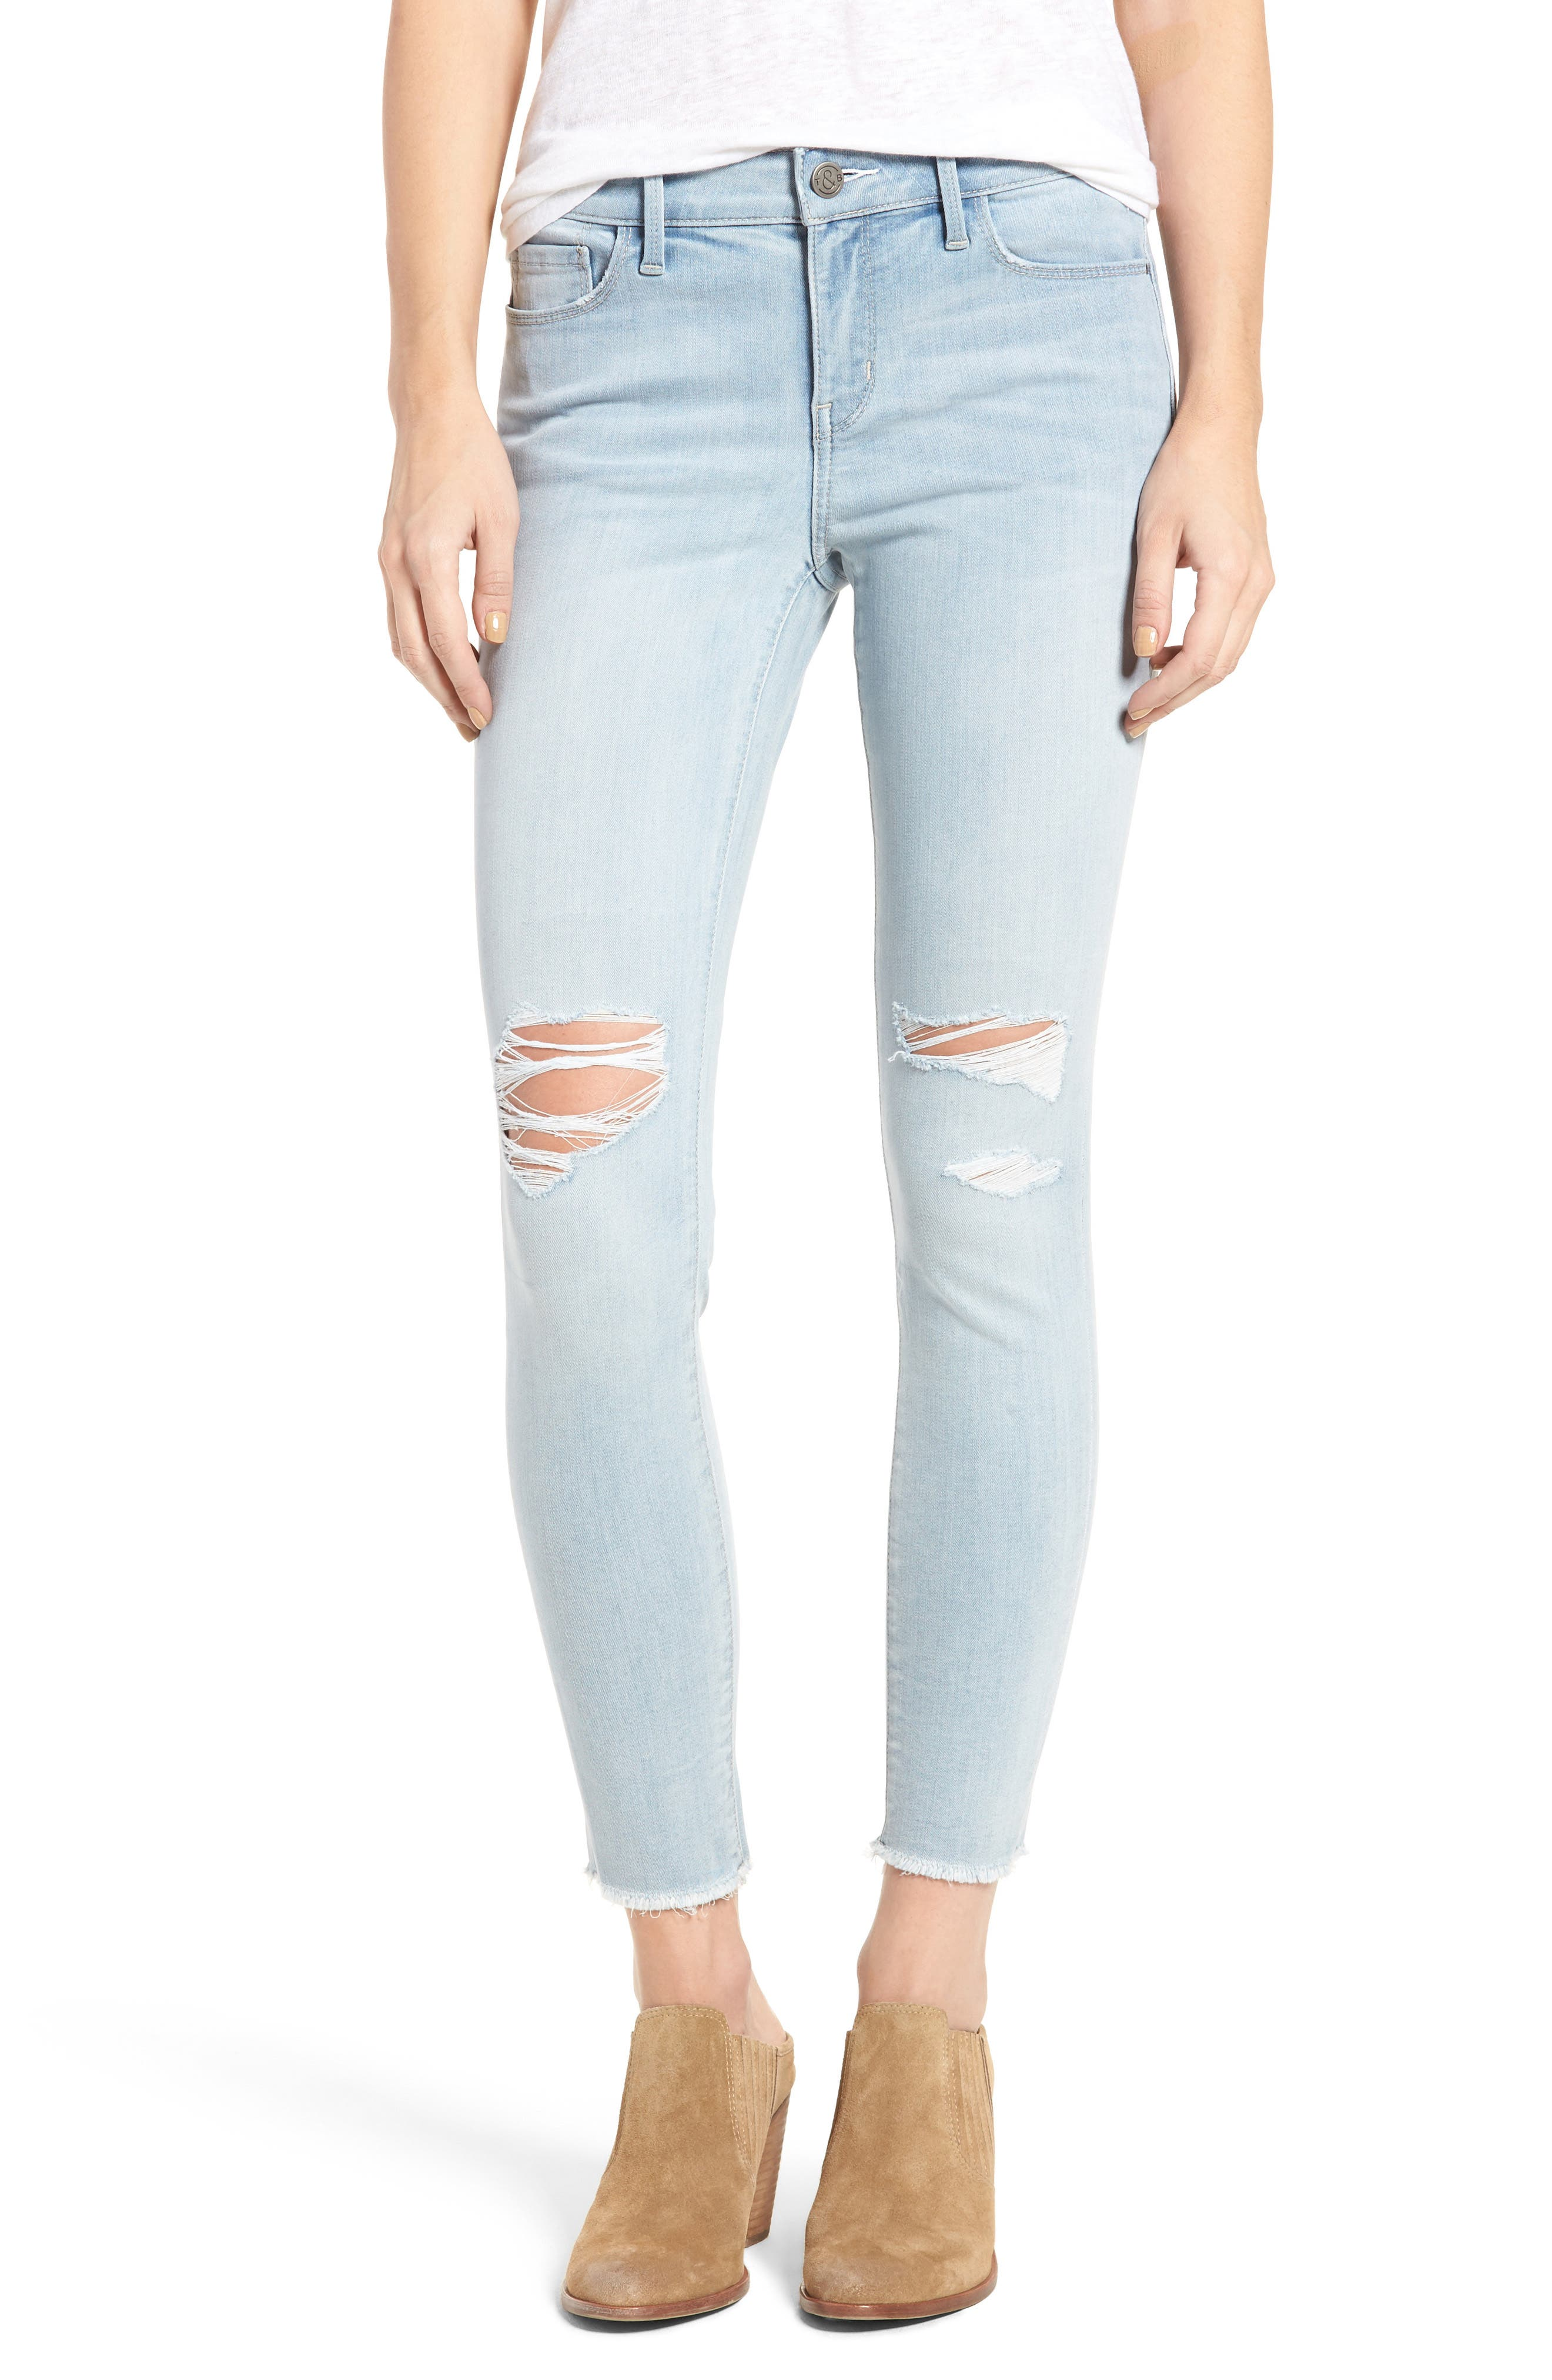 Main Image - Treasure & Bond Ankle Skinny Jeans (Mode Extra Light Destroy)